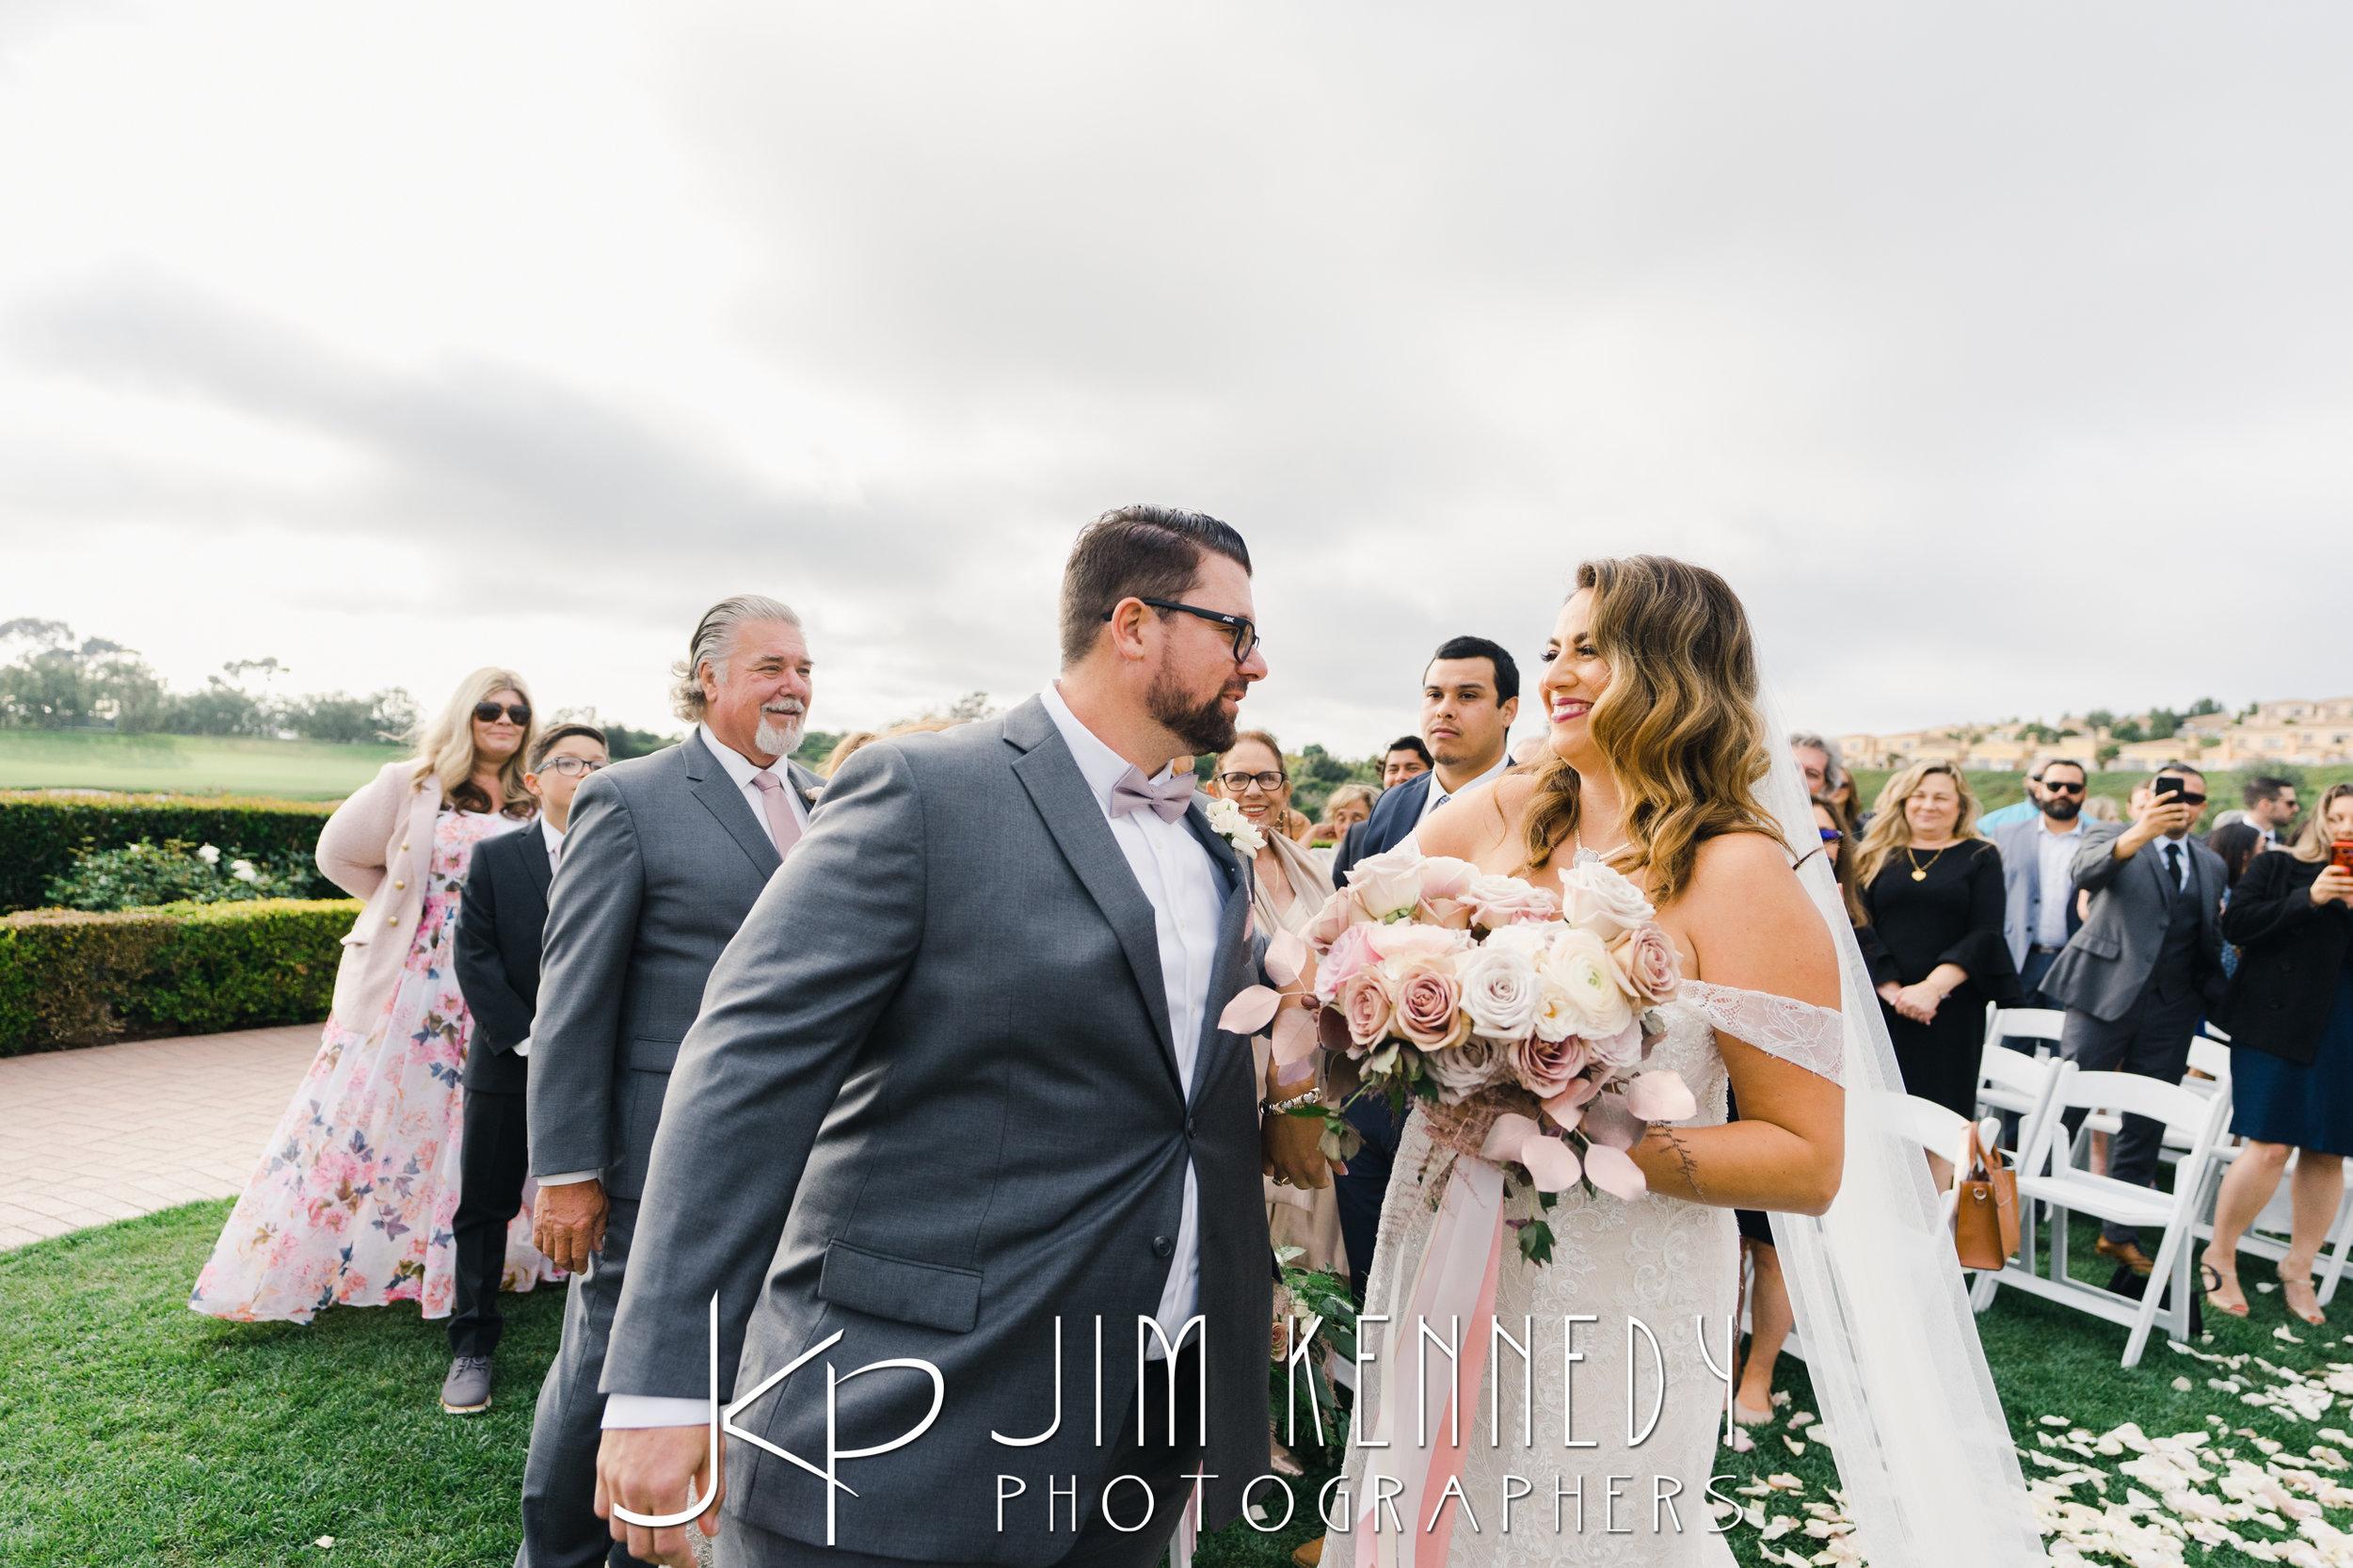 pelican-hill-wedding-jim-kenedy-photographers_0112.JPG